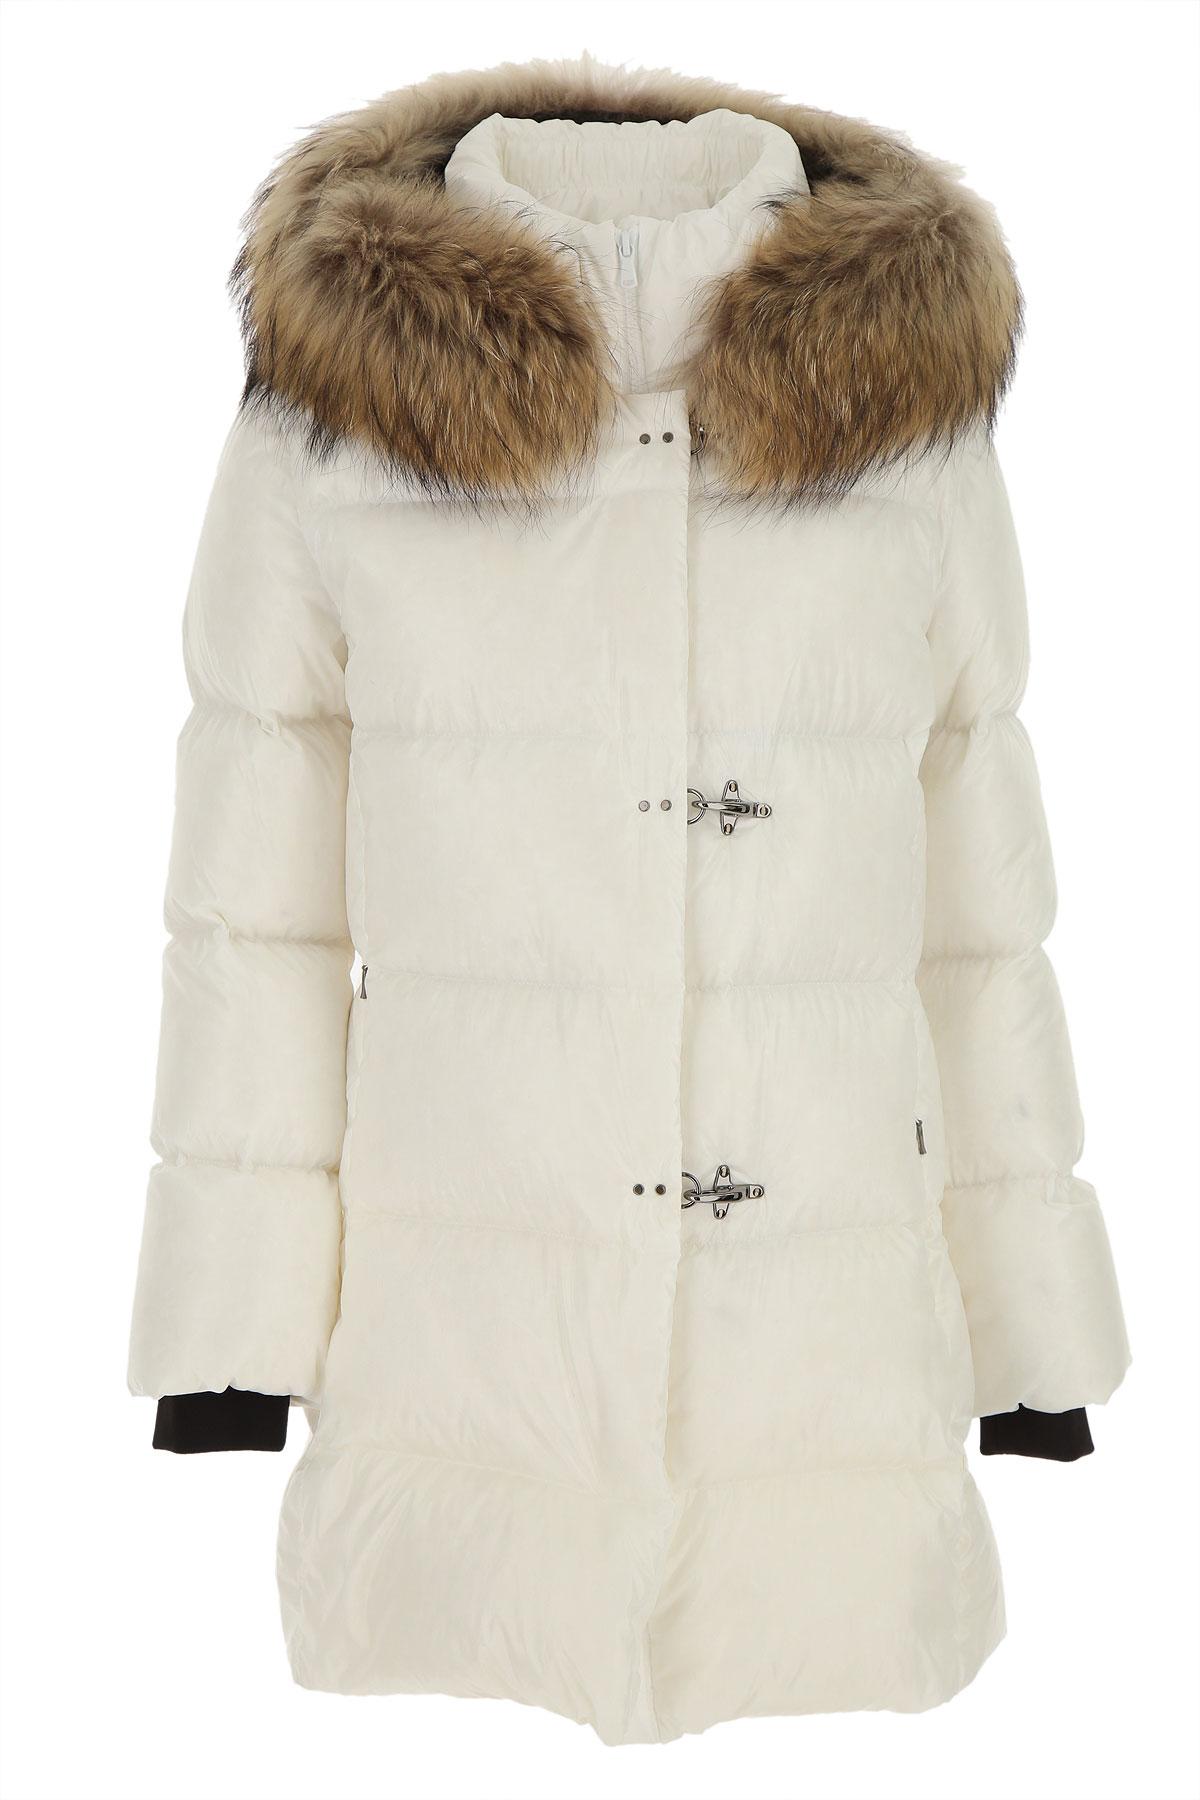 Fay Down Jacket for Women, Puffer Ski Jacket On Sale, White, polyamide, 2019, 2 4 6